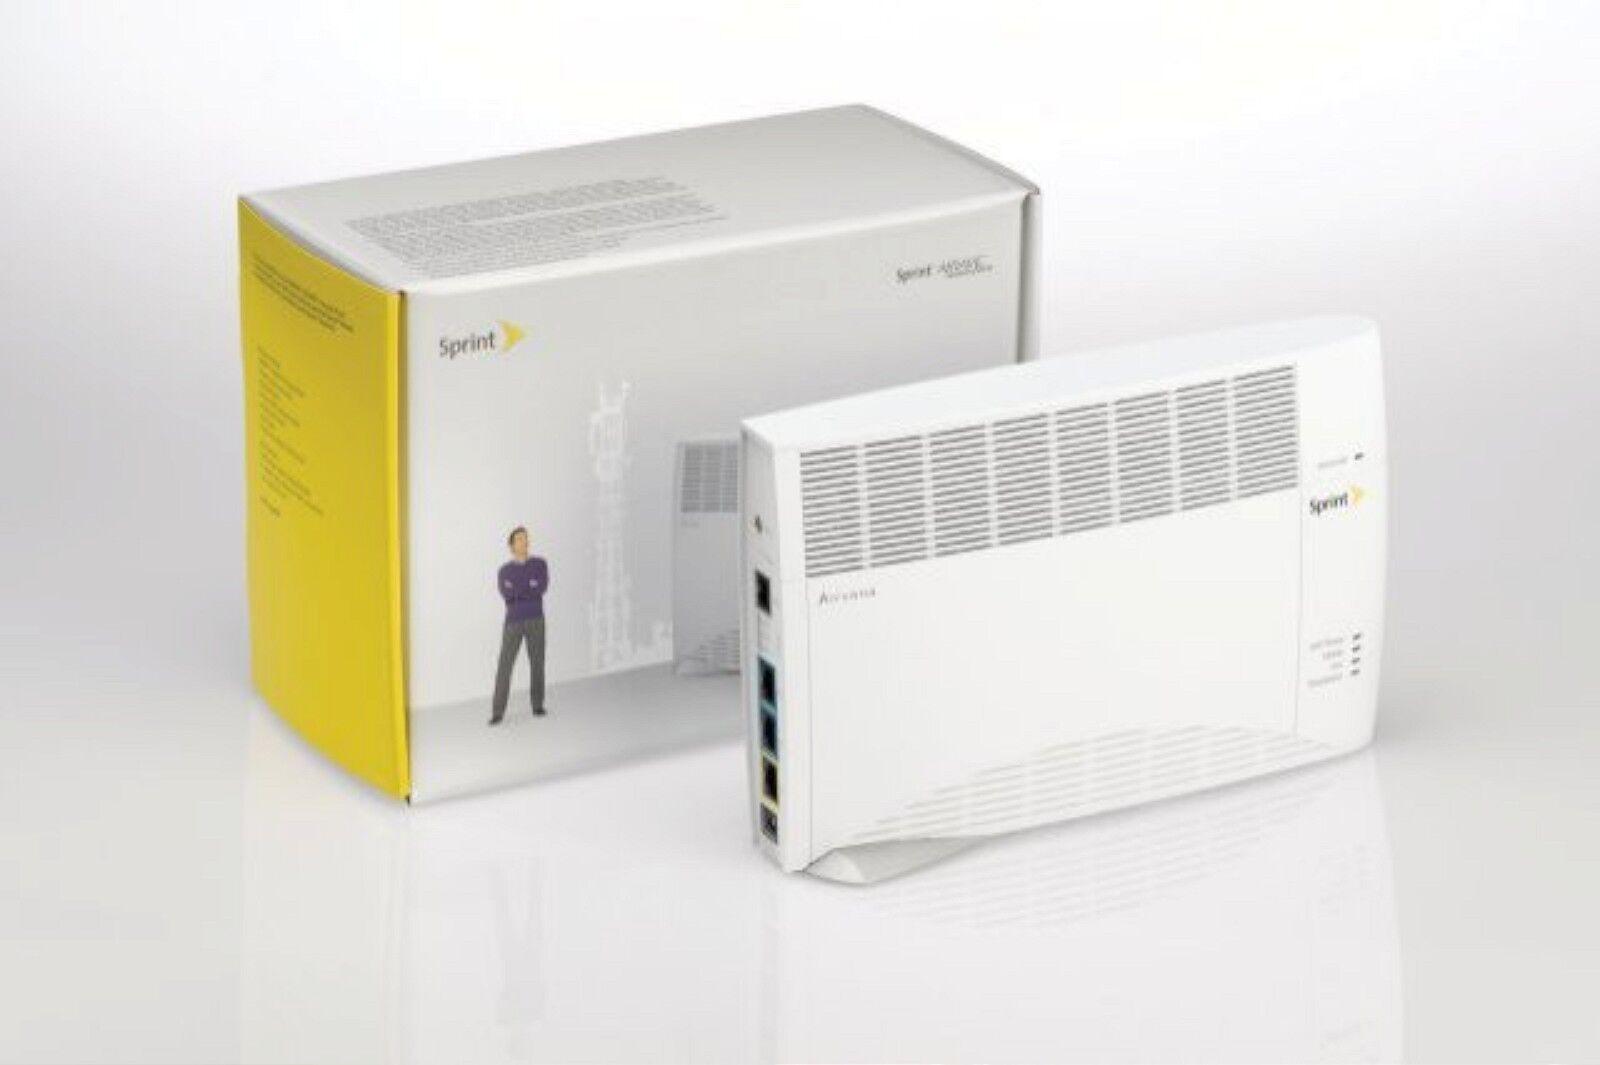 airvana airave sprint access point c1 600 rt cellphone signal rh ebay com Samsung AIRAVE Sprint Sprint Signal Booster